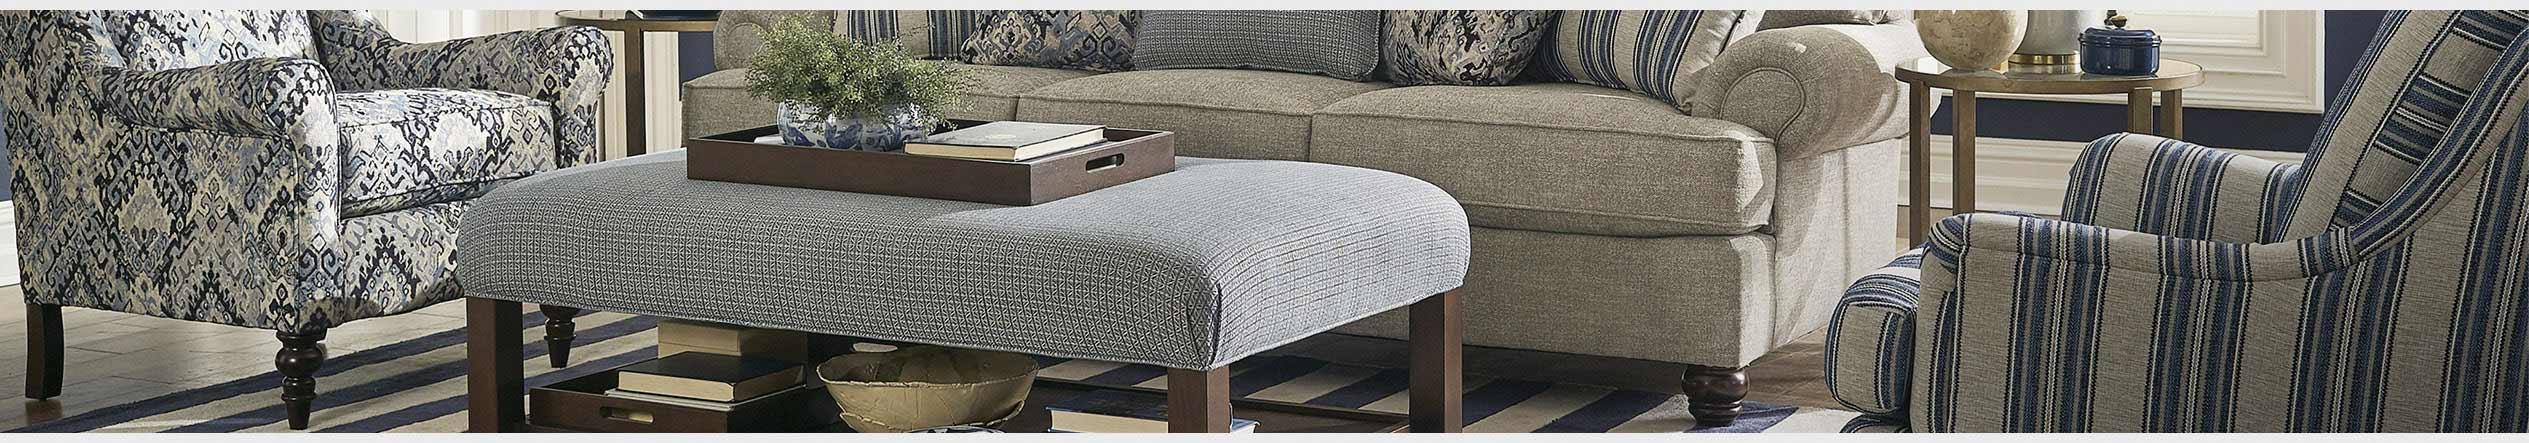 b4b68b3c3b9 Living Room Ottomans at Jordan's Furniture stores in MA, NH, RI and CT